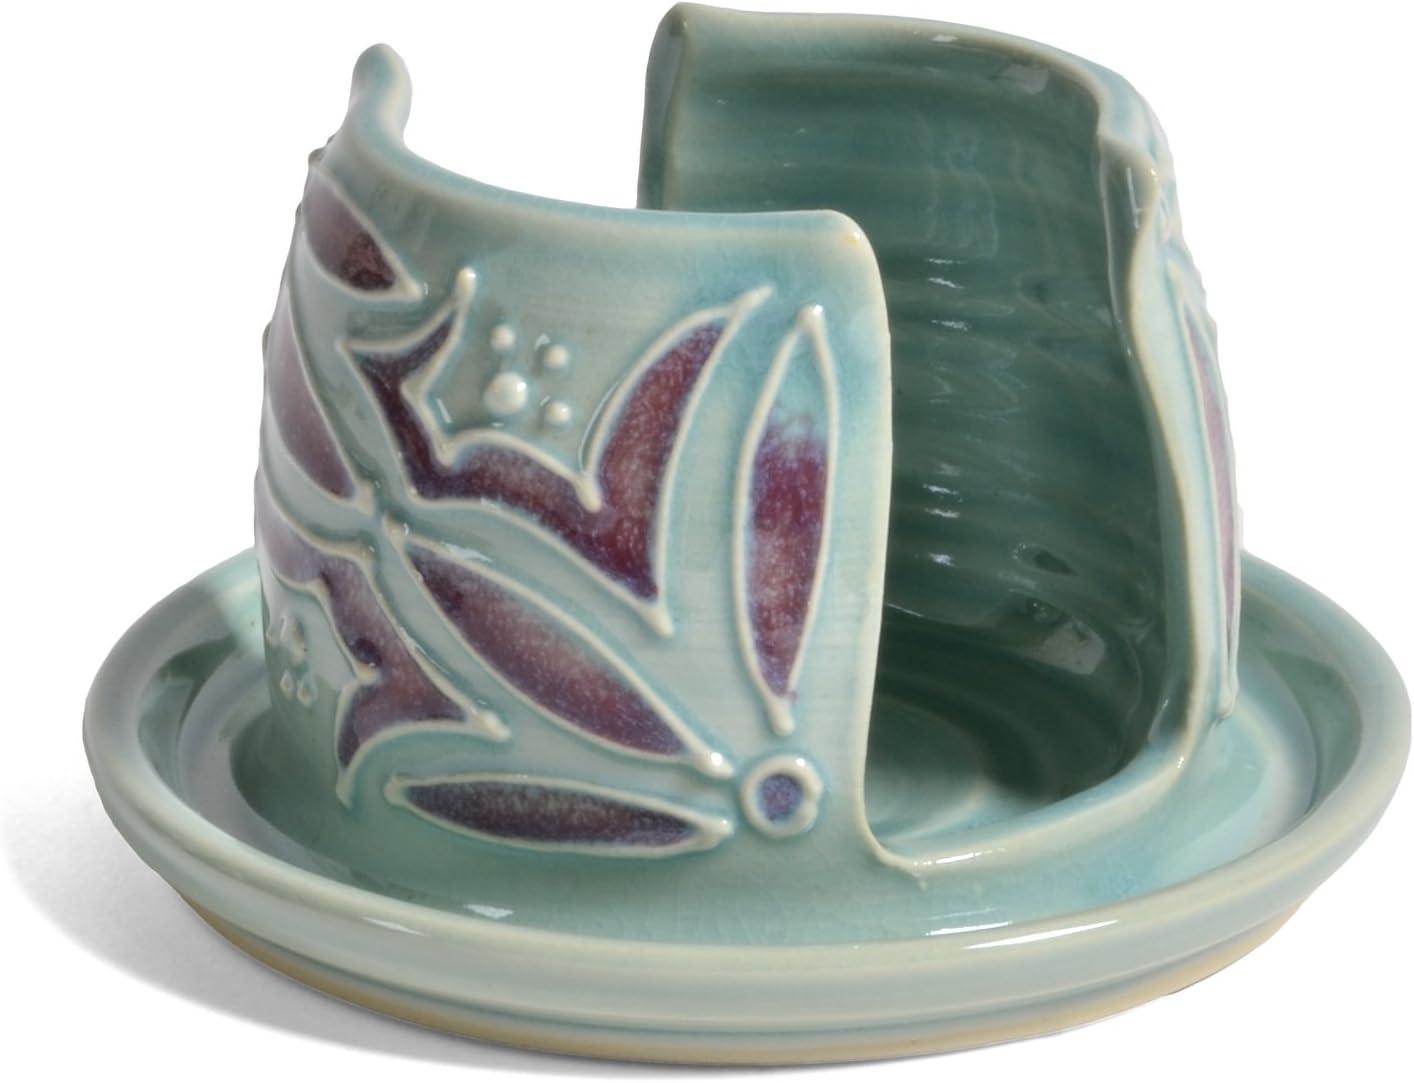 Amber AshenWren Ceramics Sponge Holder Home Dcor Decorative Bowls ...